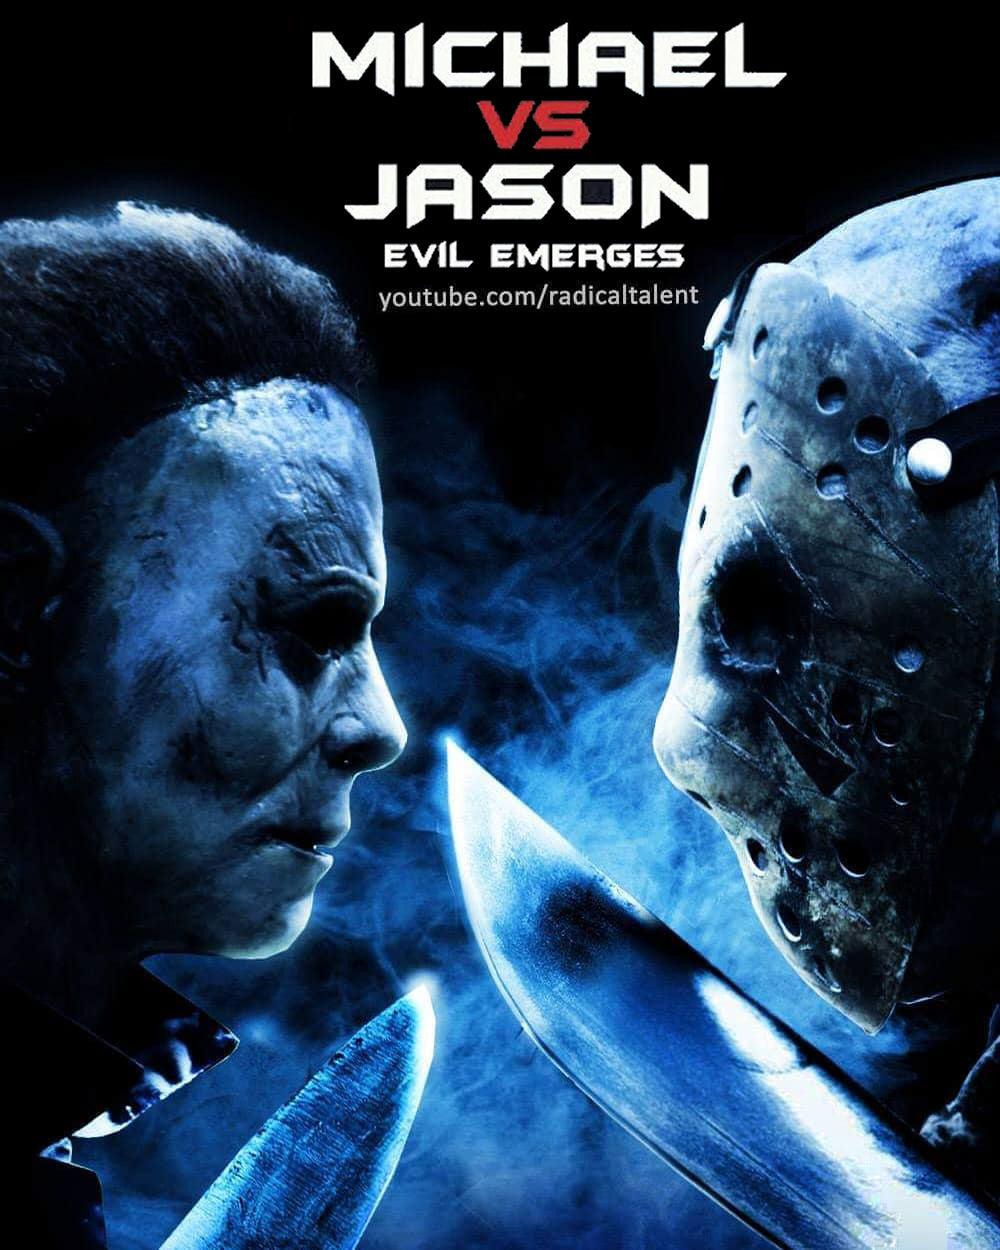 The Horrors of Halloween: Watch MICHAEL VS. JASON: EVIL EMERGES Fan Film